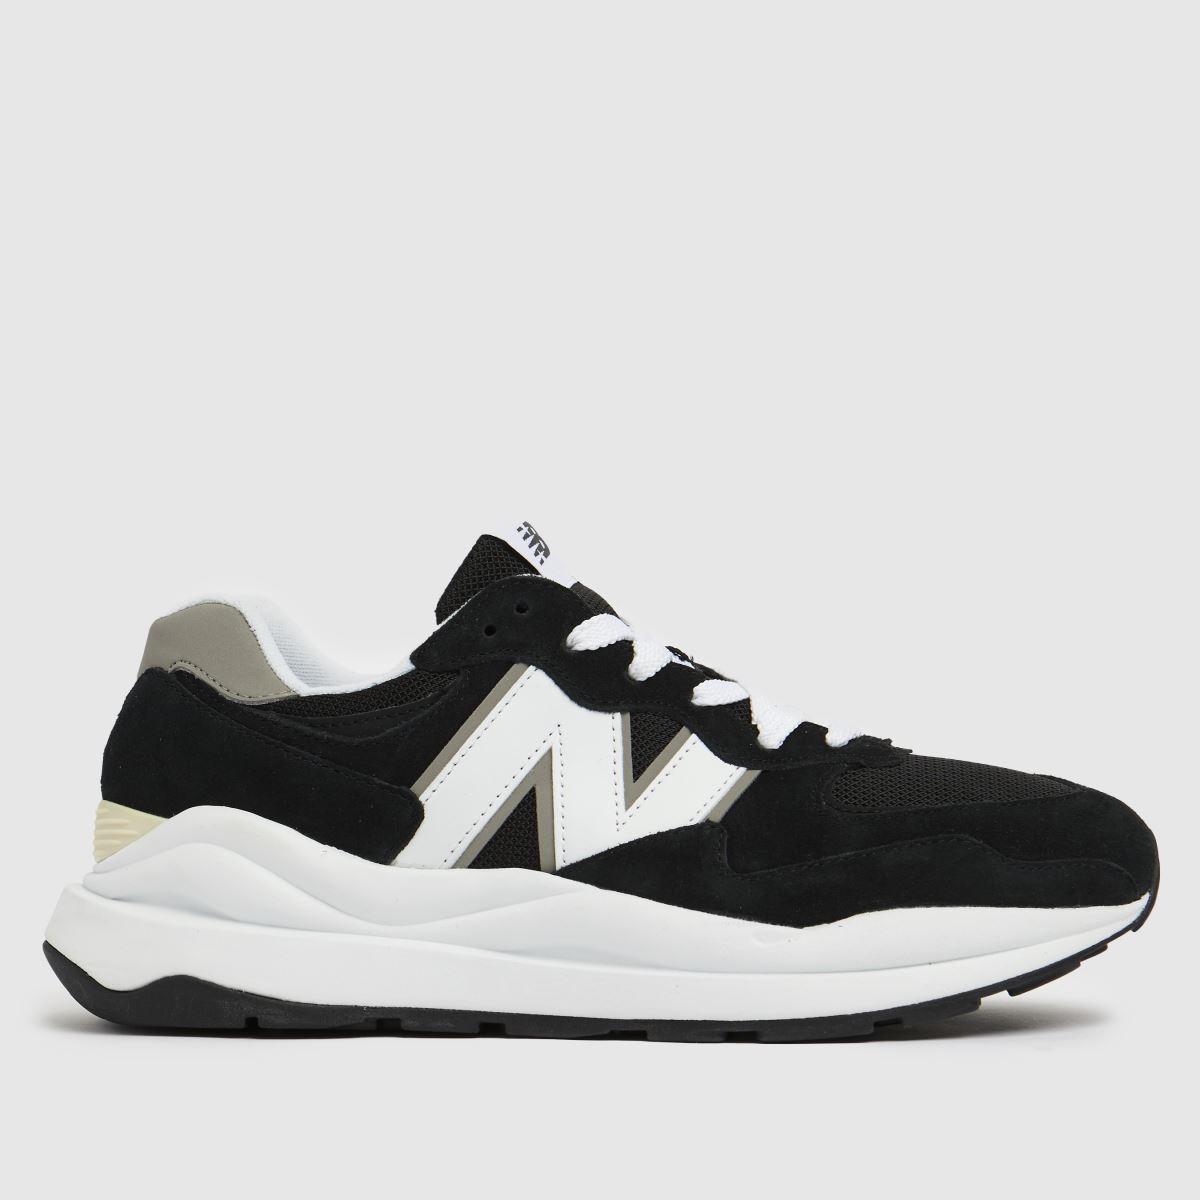 New Balance Black & White 57/40 Trainers